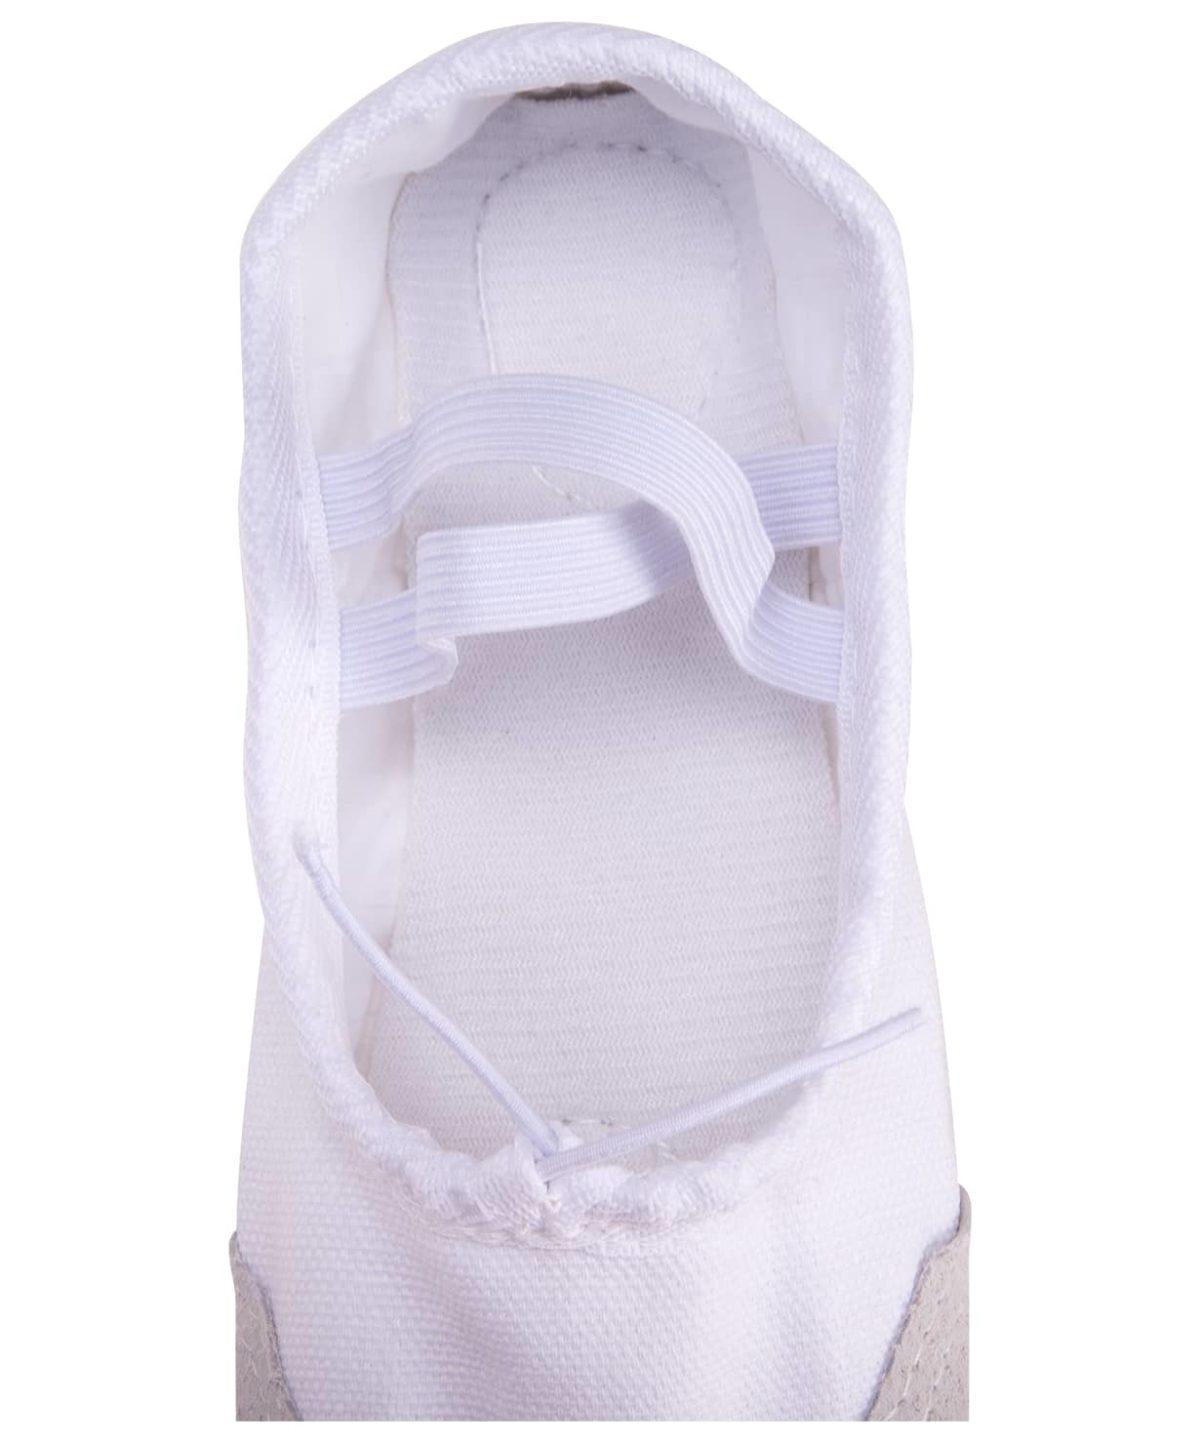 AMELY Балетки текстиль (27-31)  SL-01: белый - 2